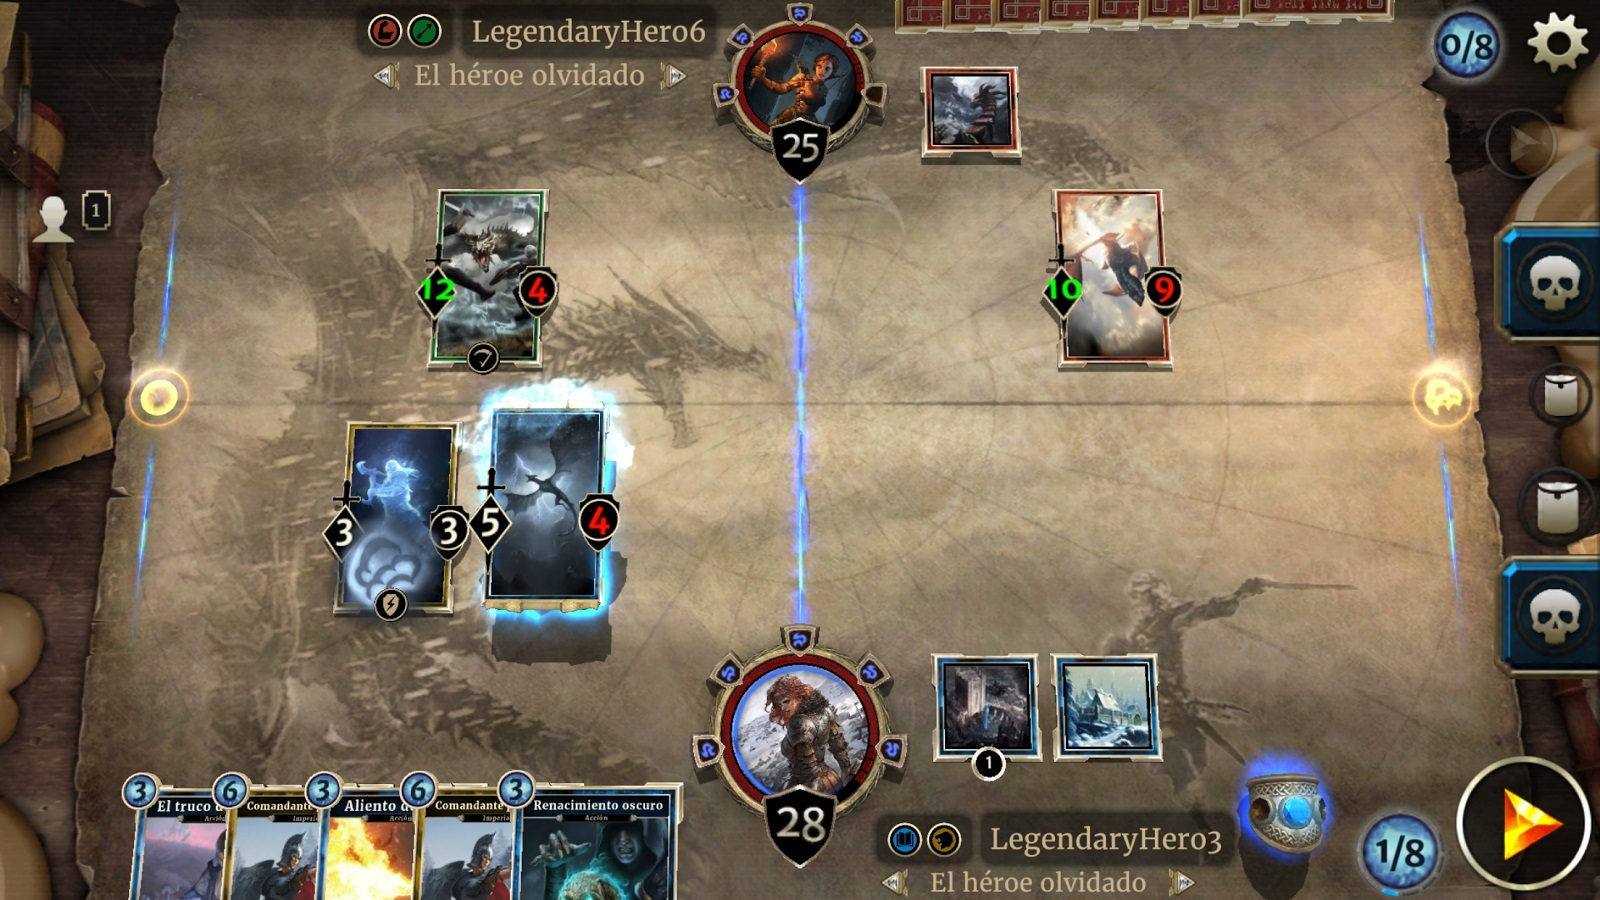 The Elder Scrolls: Legends ya disponible en teléfonos móviles